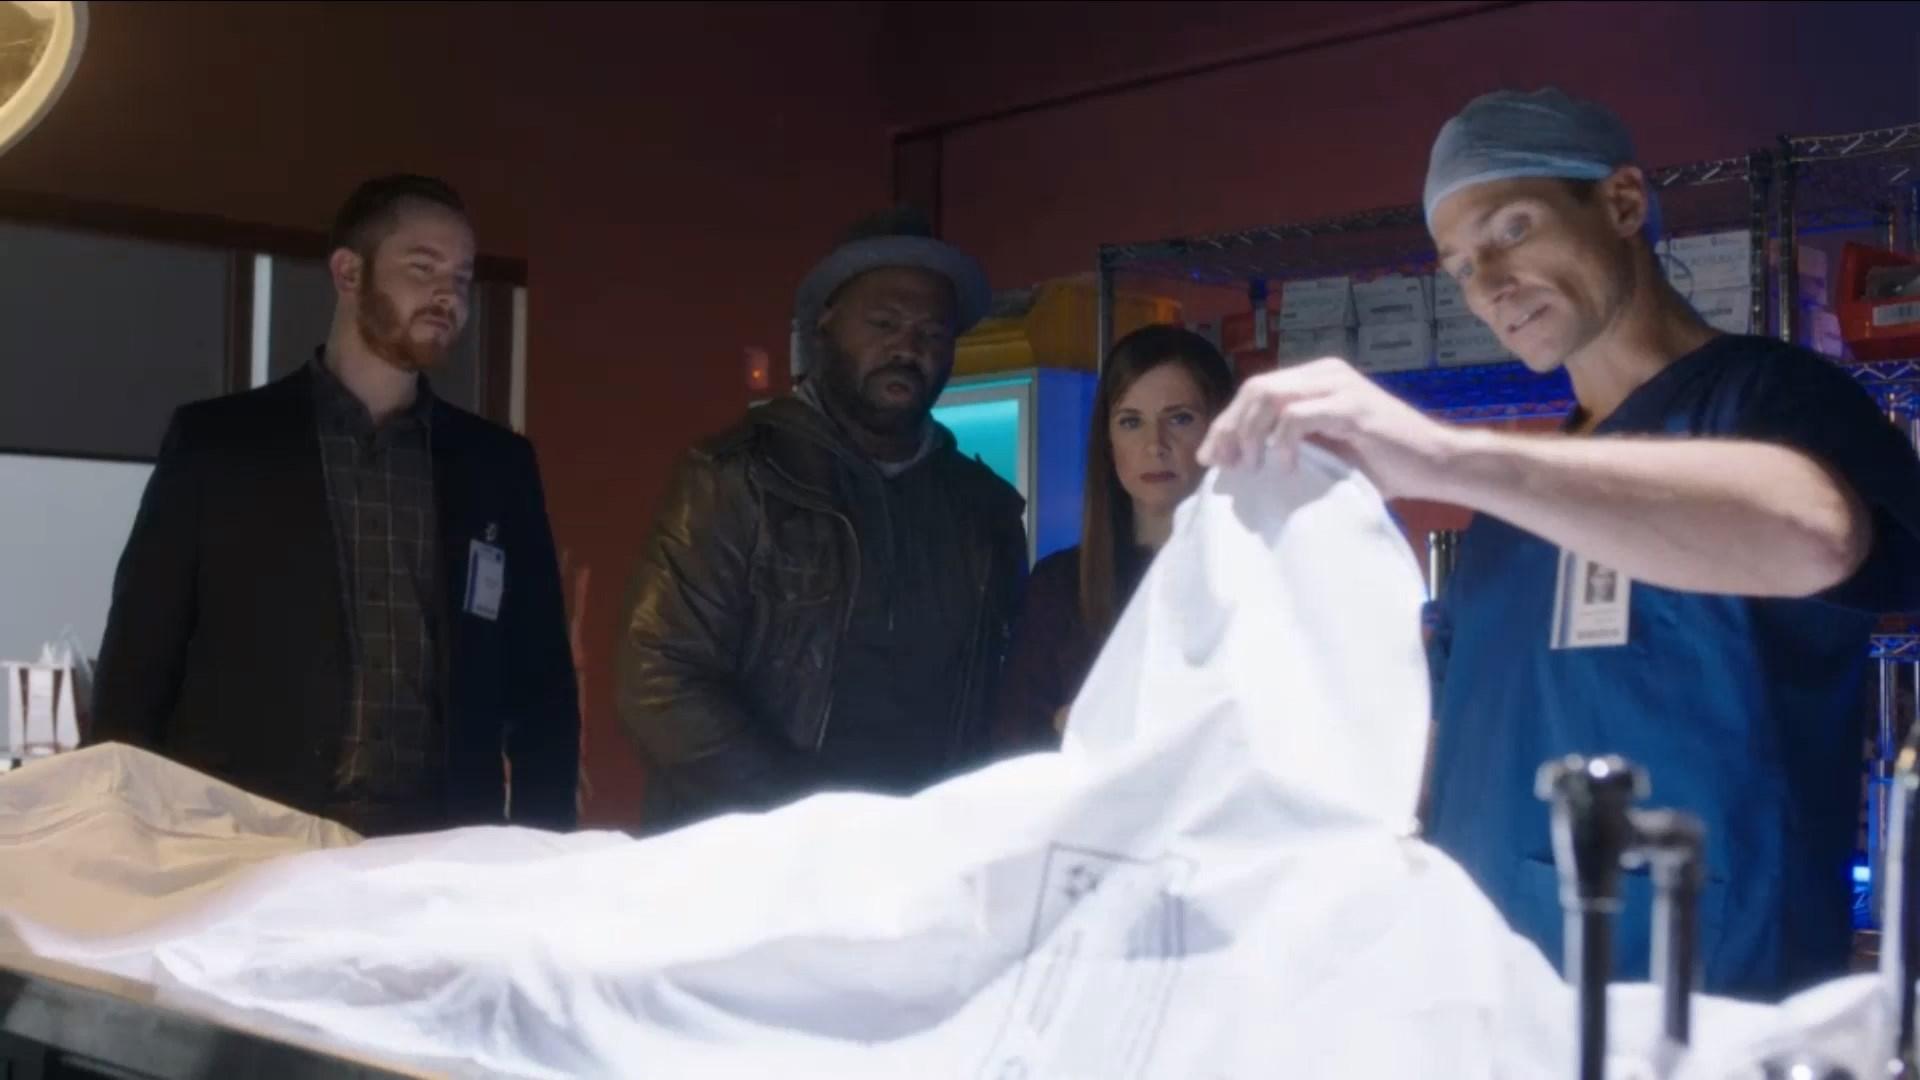 Hailey Dean Gizemi - Hailey Dean Mystery 2018 Türkçe Dublaj Film İndir